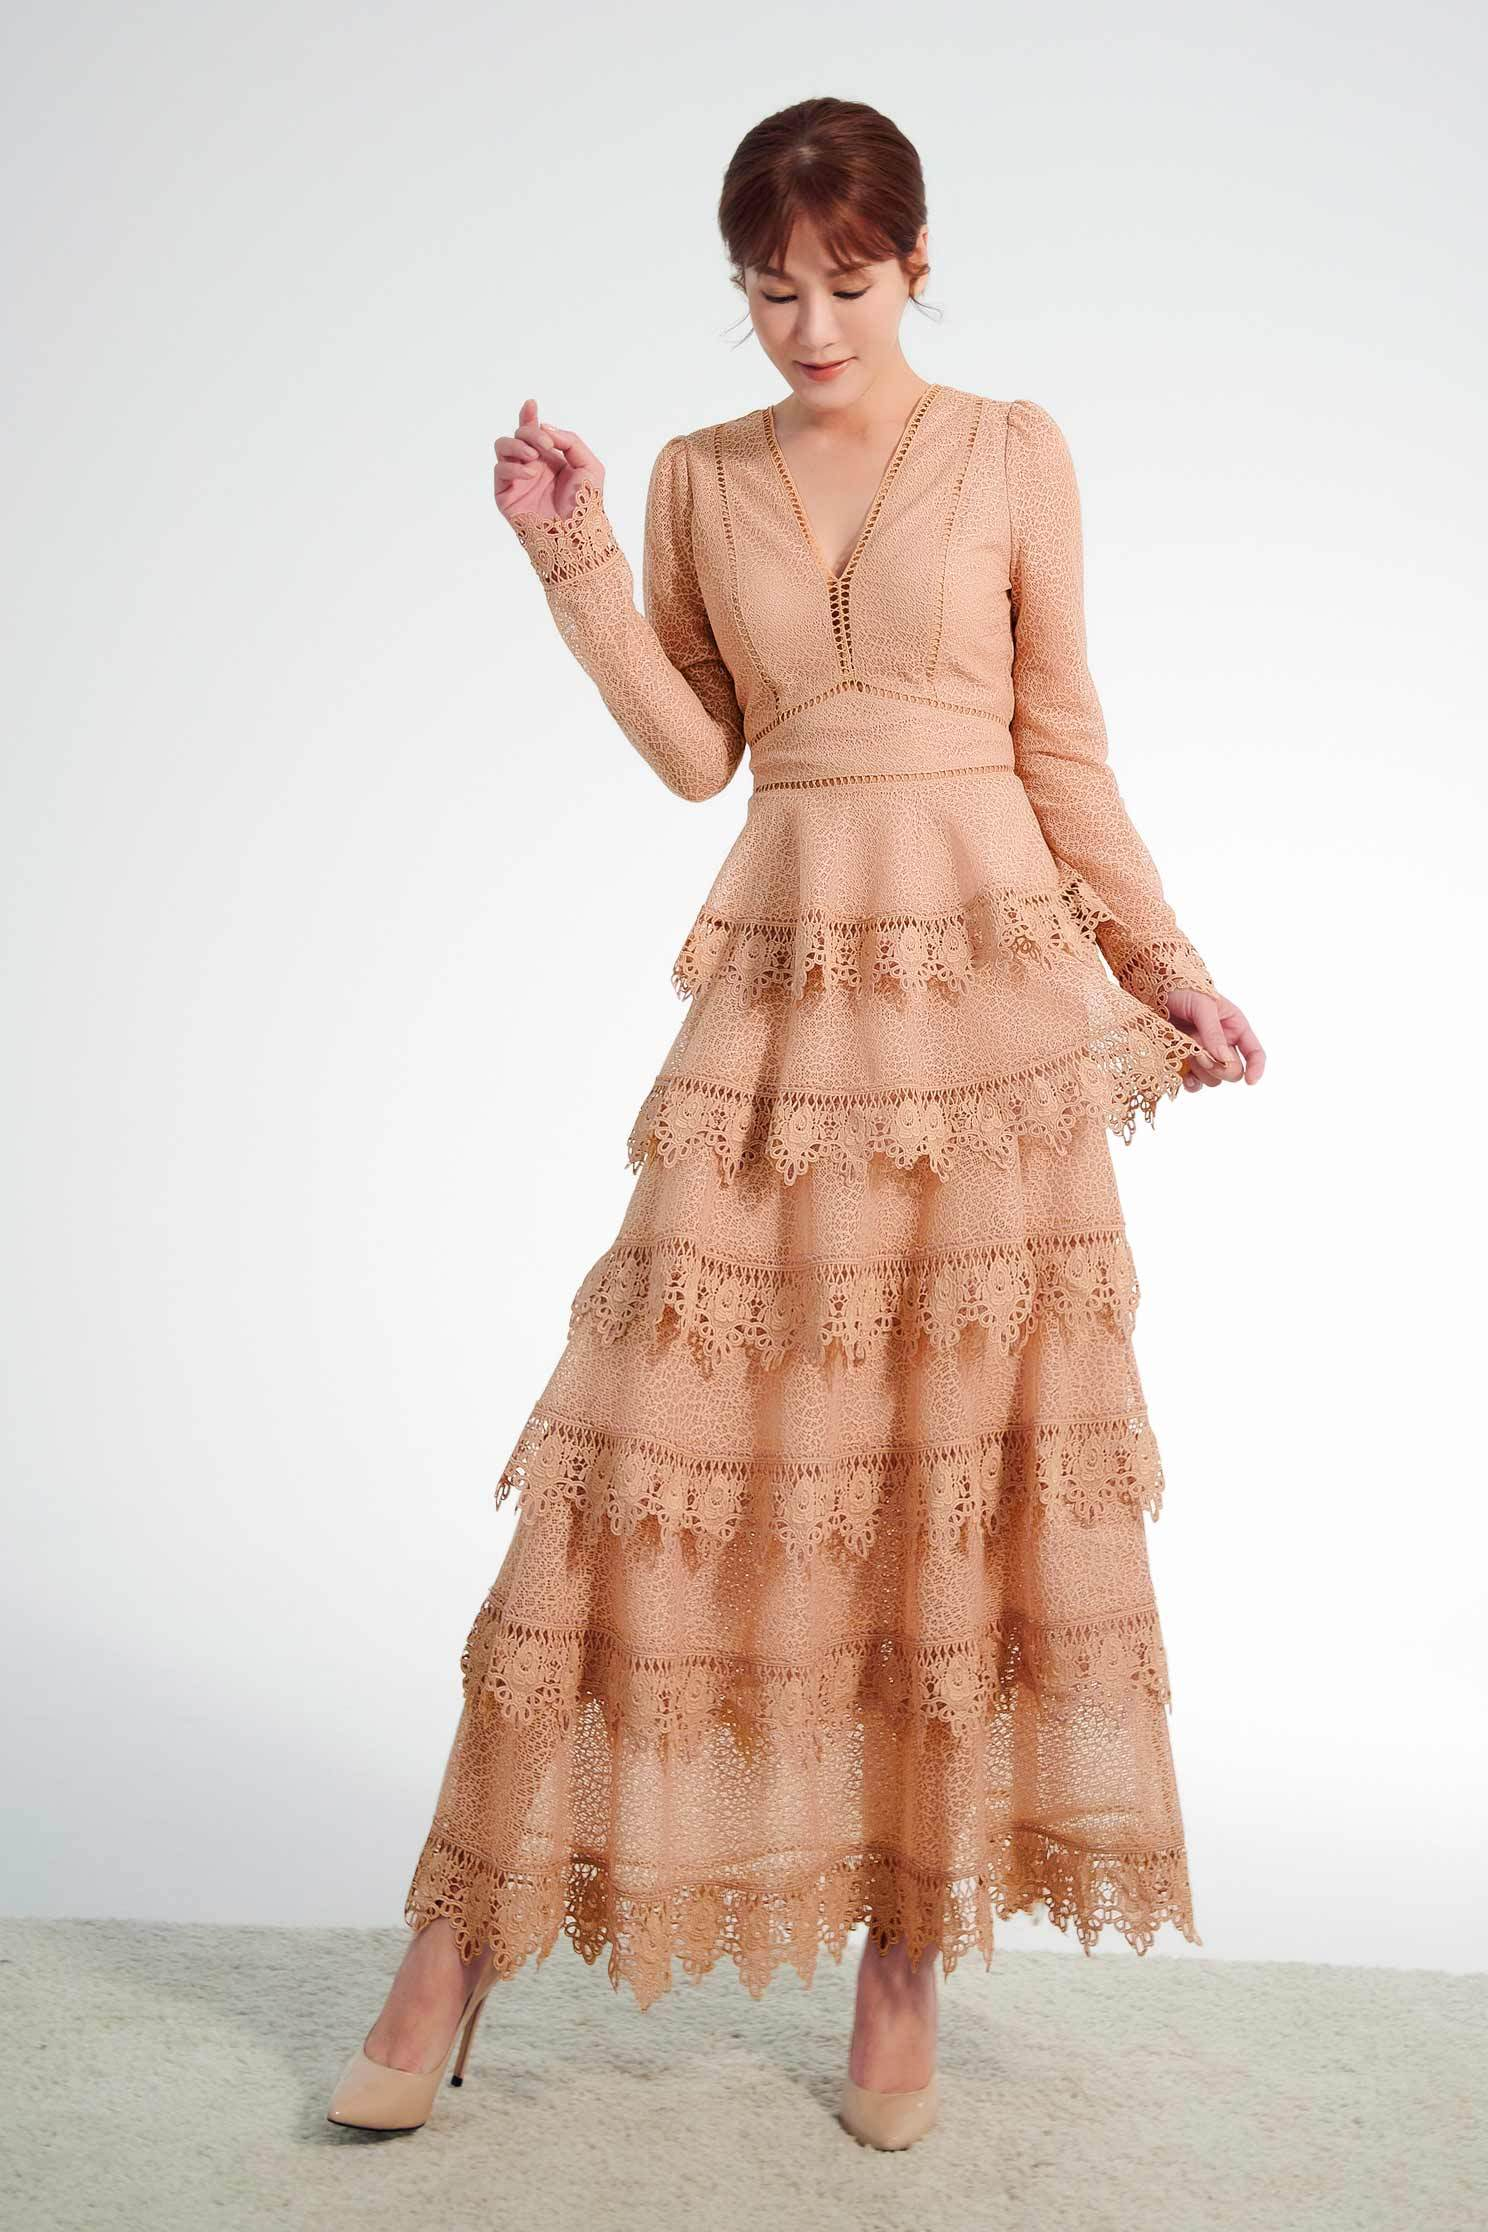 Nude lace layered dress,v-neckdress,cocktaildress,tulleskirt,lace,lacedress,longsleevedress